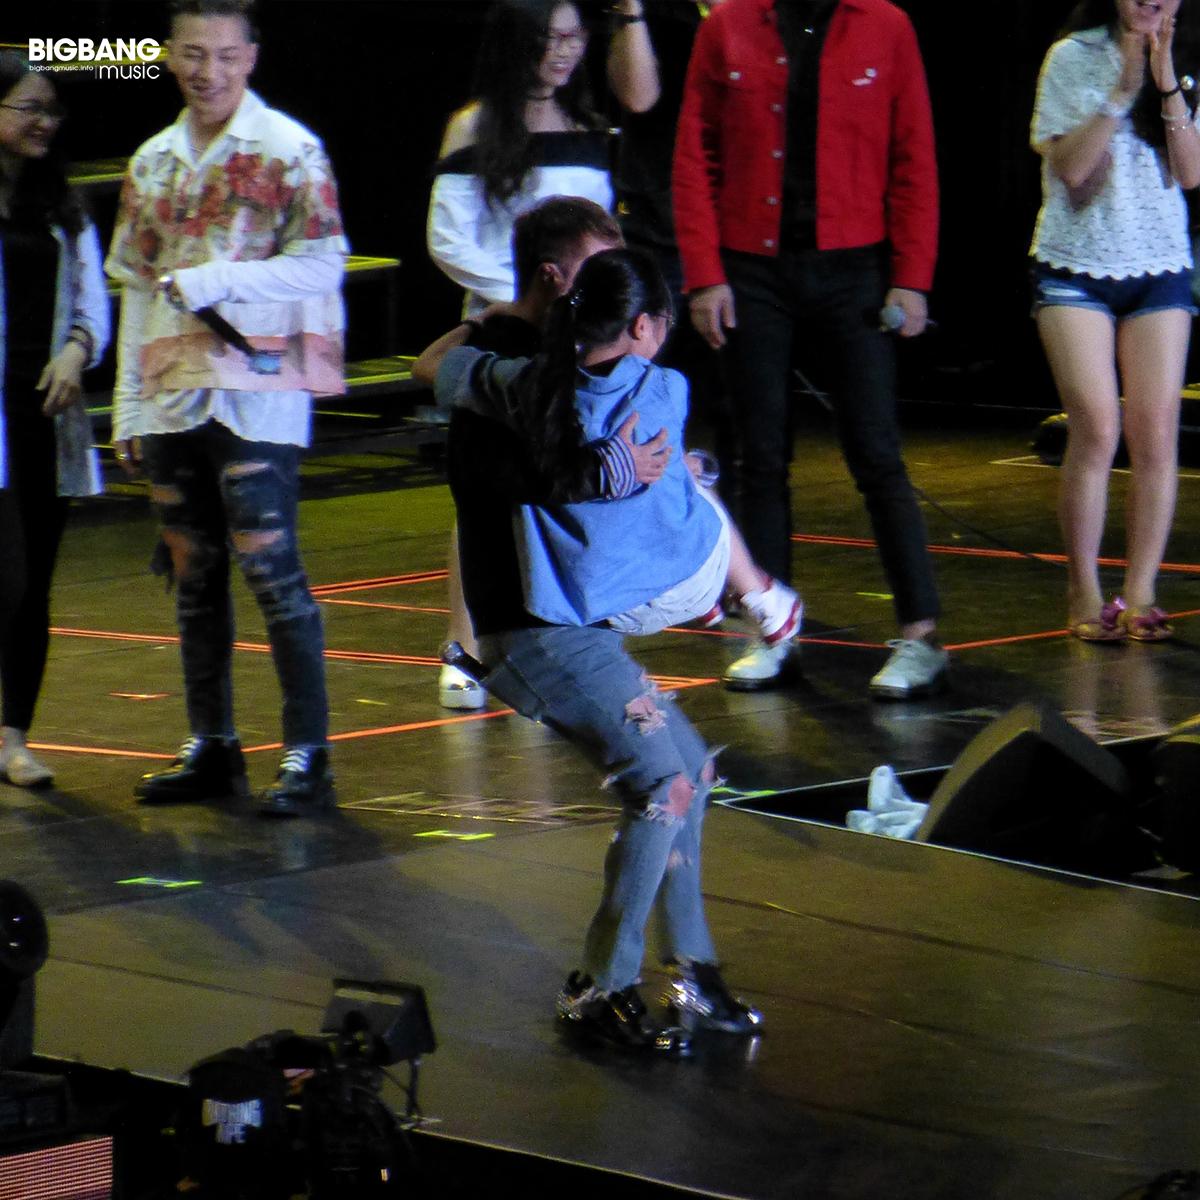 BIGBANGmusic-BIGBANG-FM-Hong-Kong-Day-2-2016-07-23-17